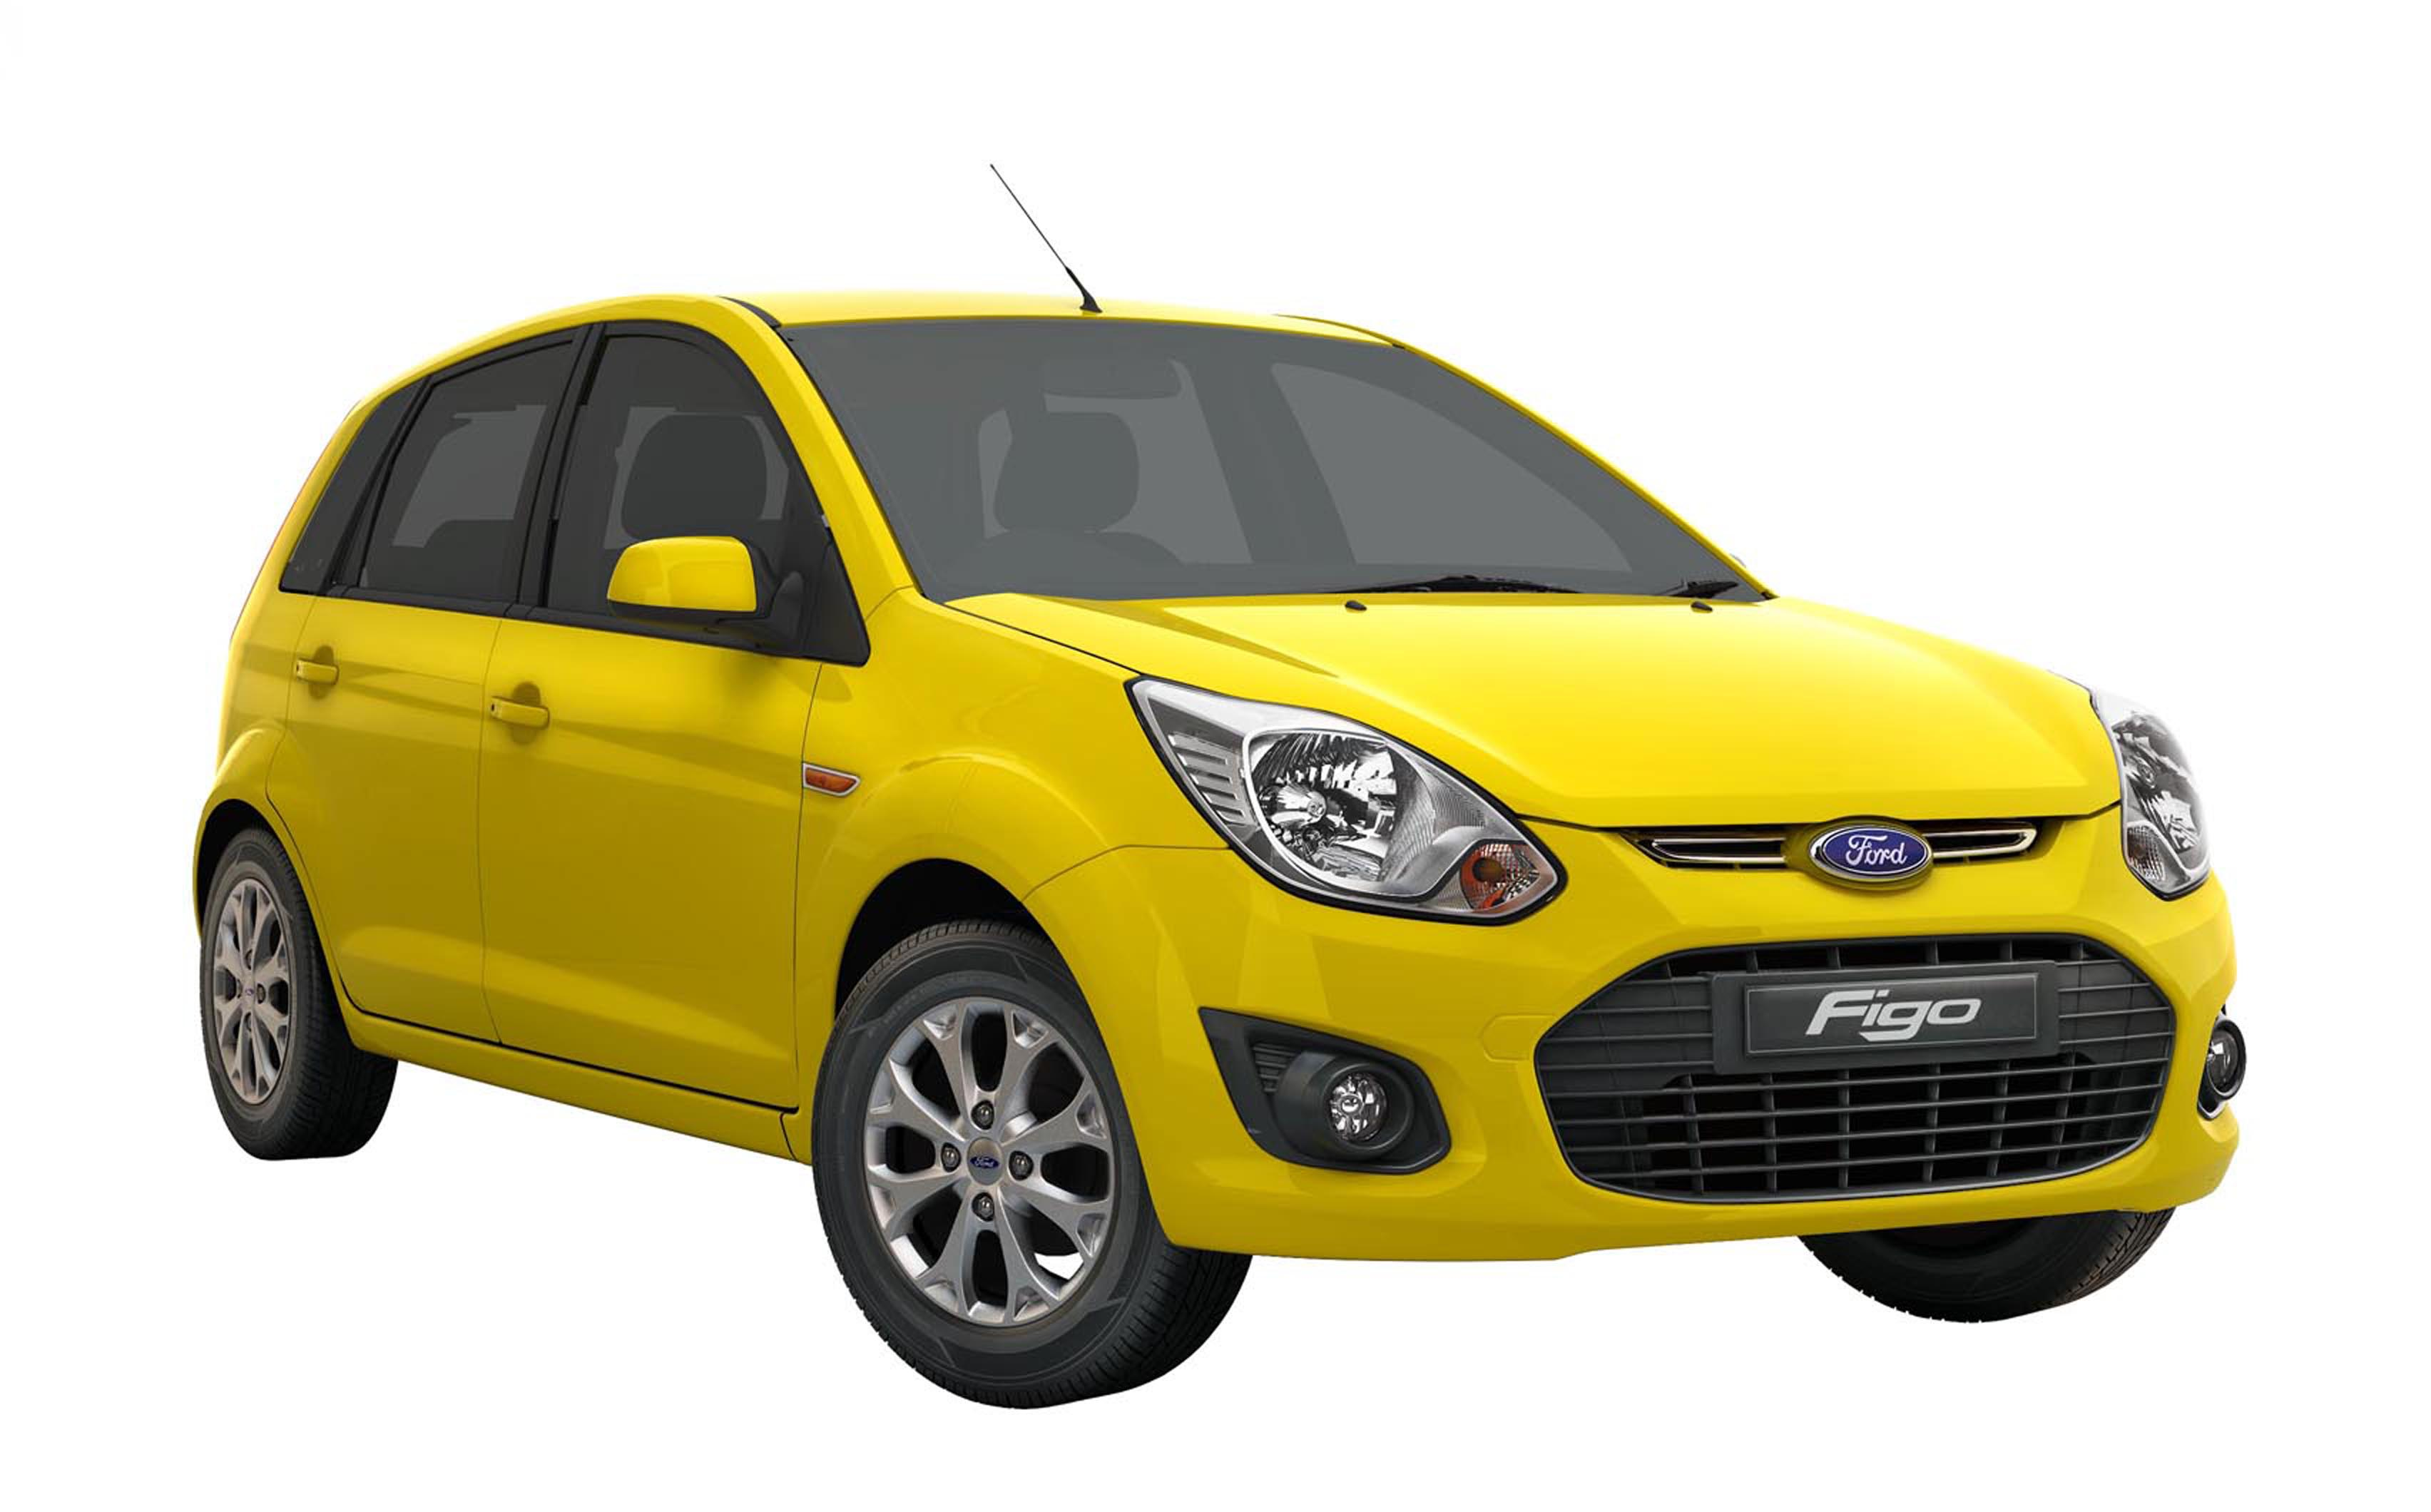 New Ford Figo Yellow Color Addition